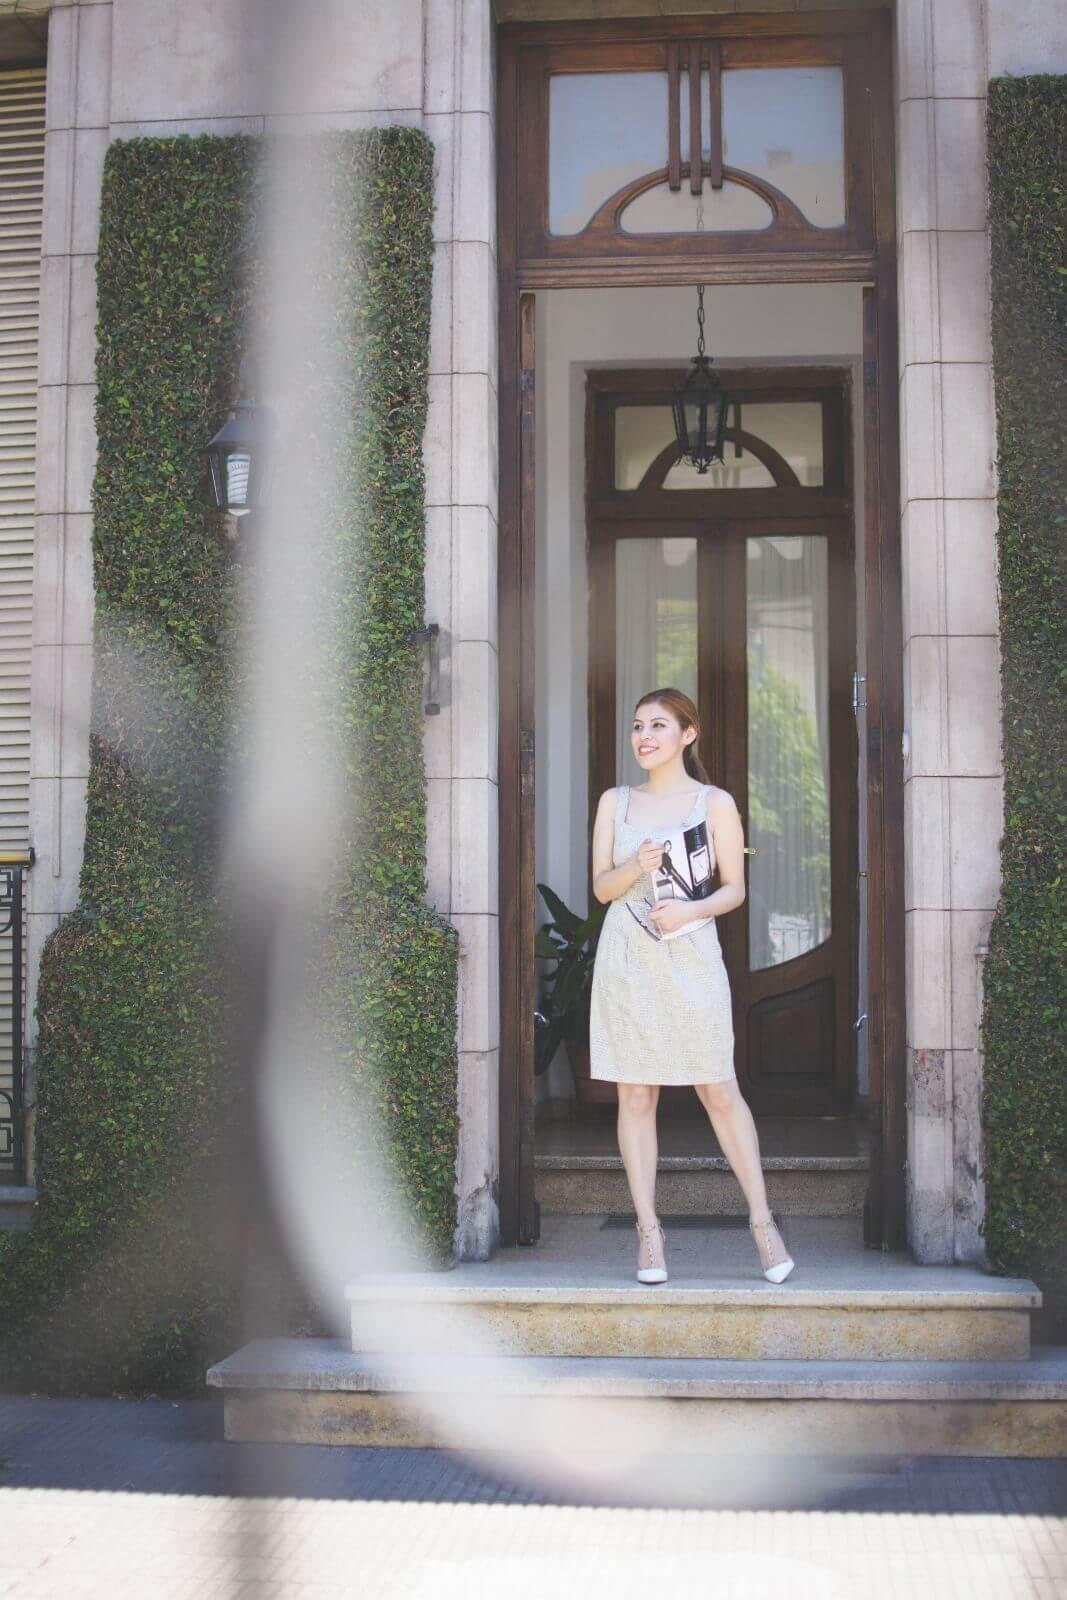 almond-white-dress-sammydress-stilettos-valentino-rockstud-imitation-deborah-ferrero-style-by-deb-ladylike13